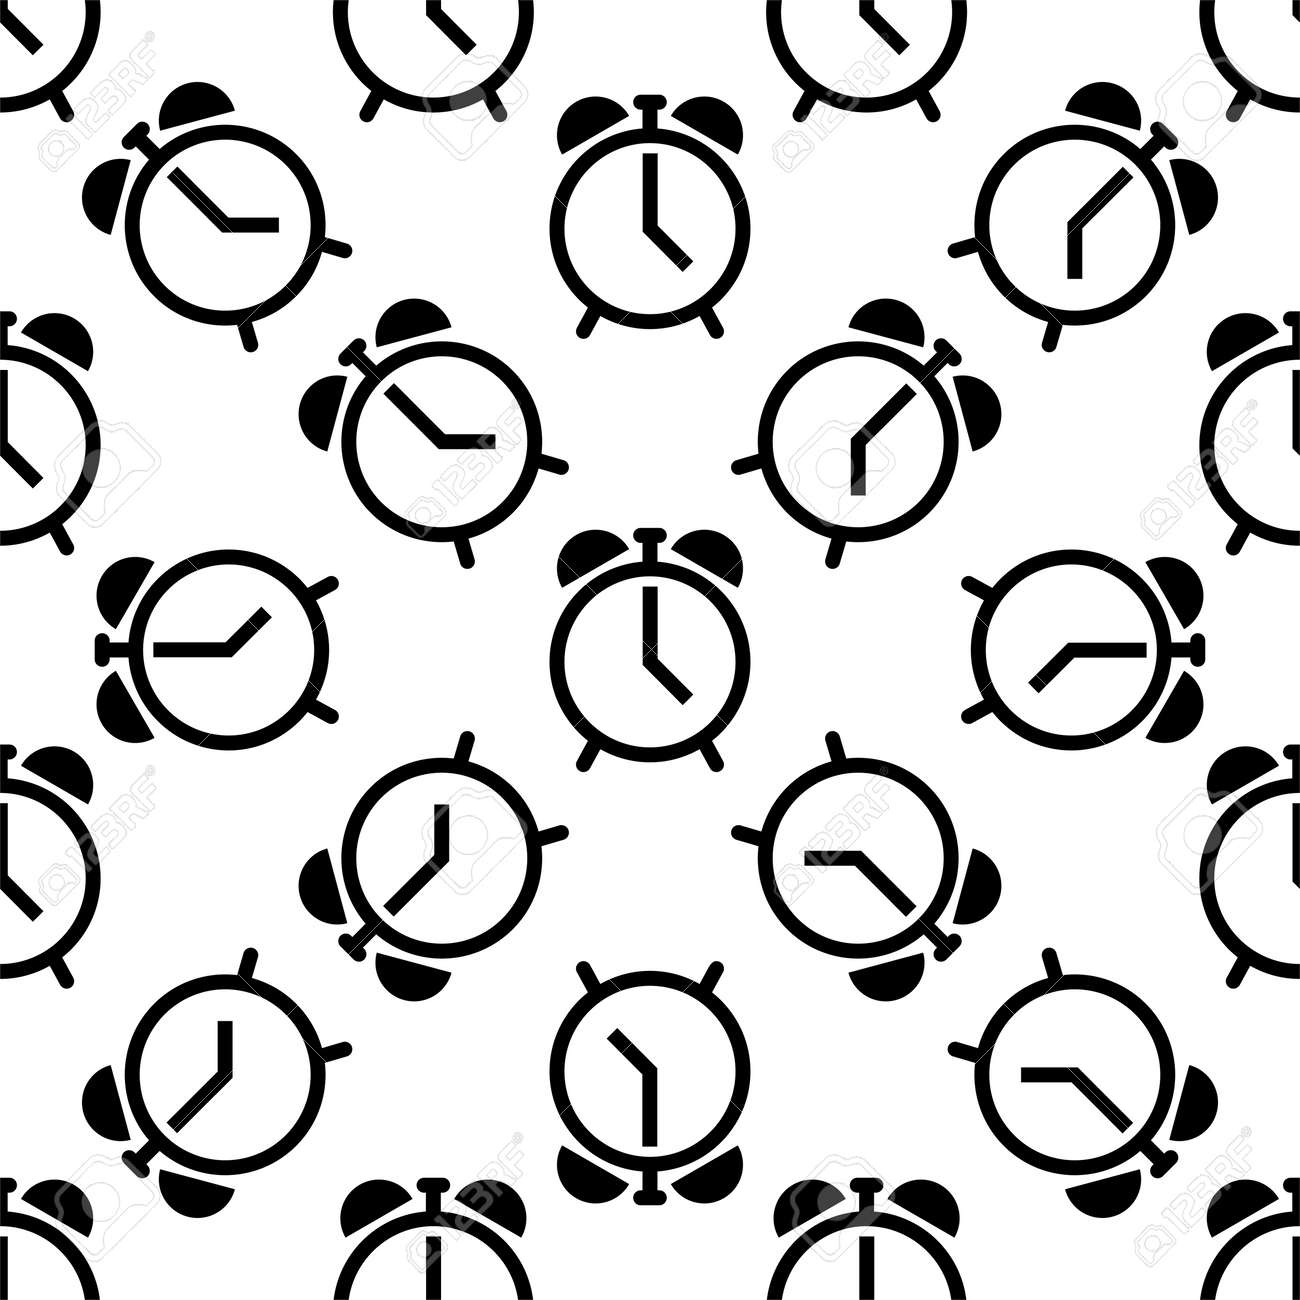 Alarm Clock Icon Seamless Pattern Vector Art Illustration - 149571155